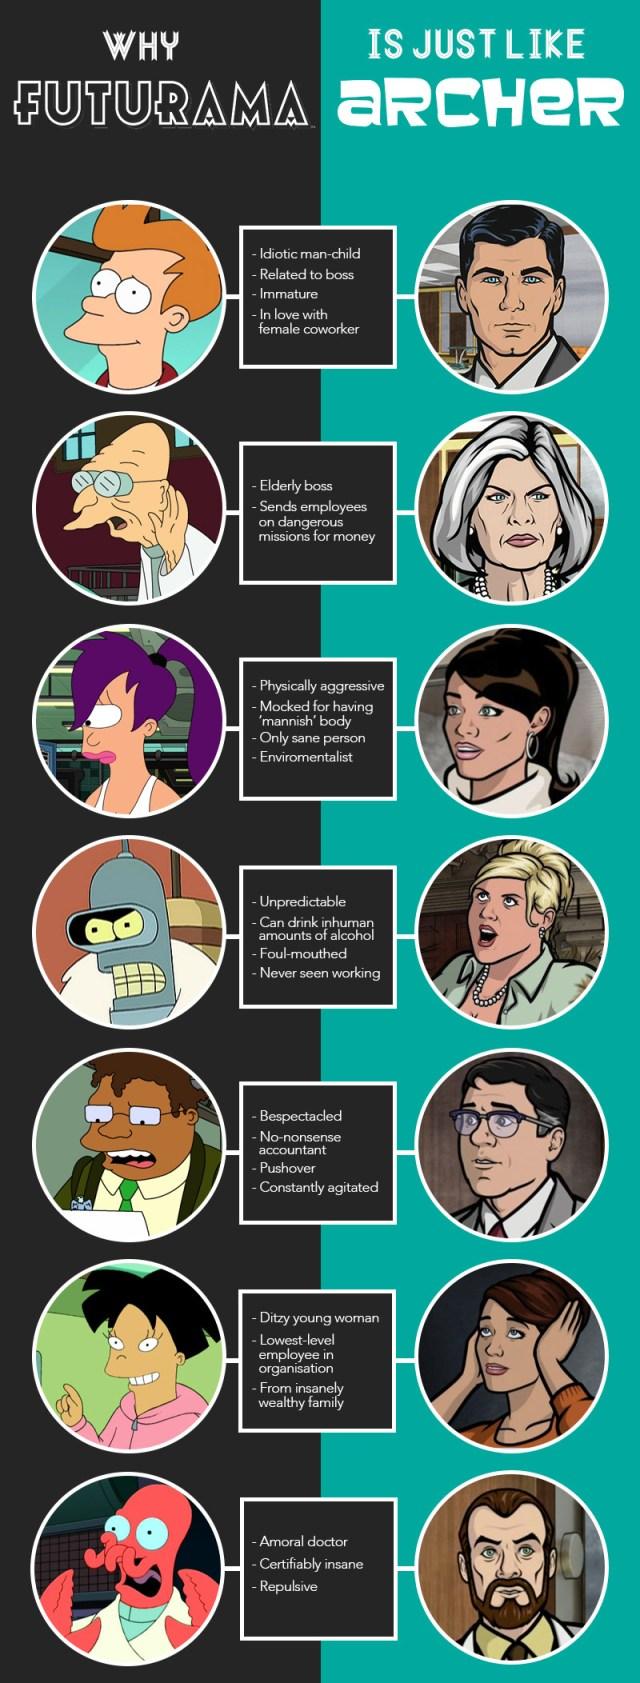 How Futurama Is Just Like Archer